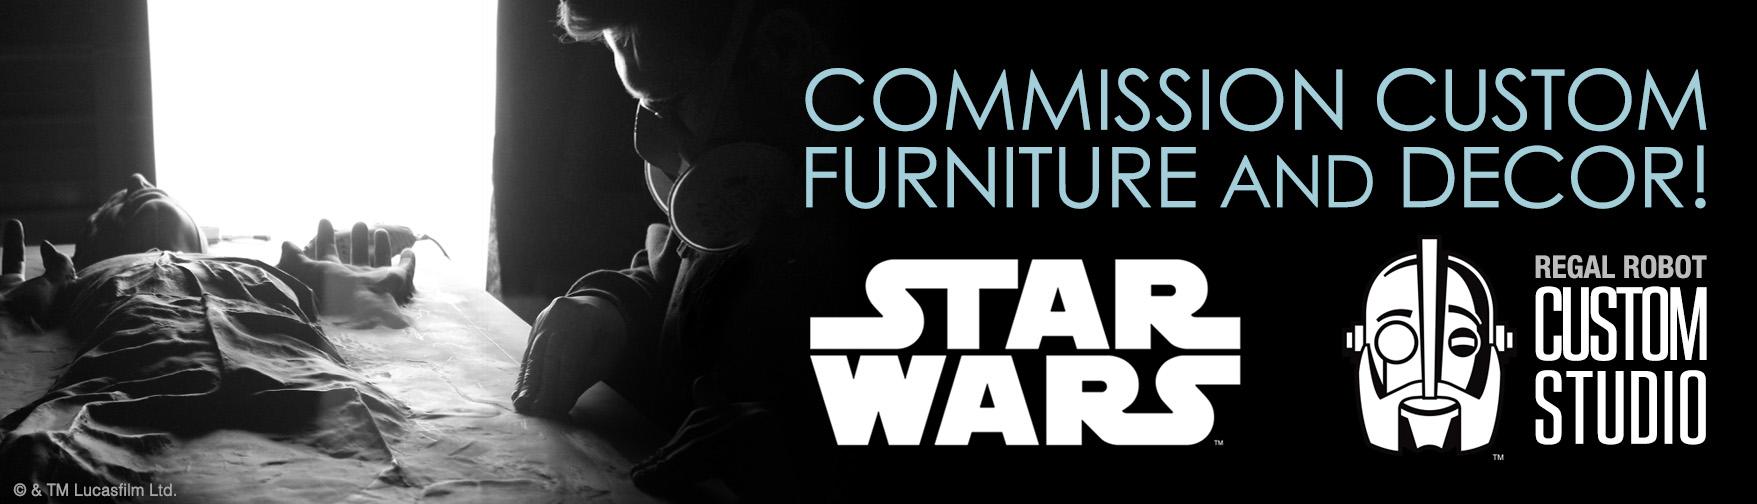 Star Wars Custom Studio – Custom Furniture, Art & Decor